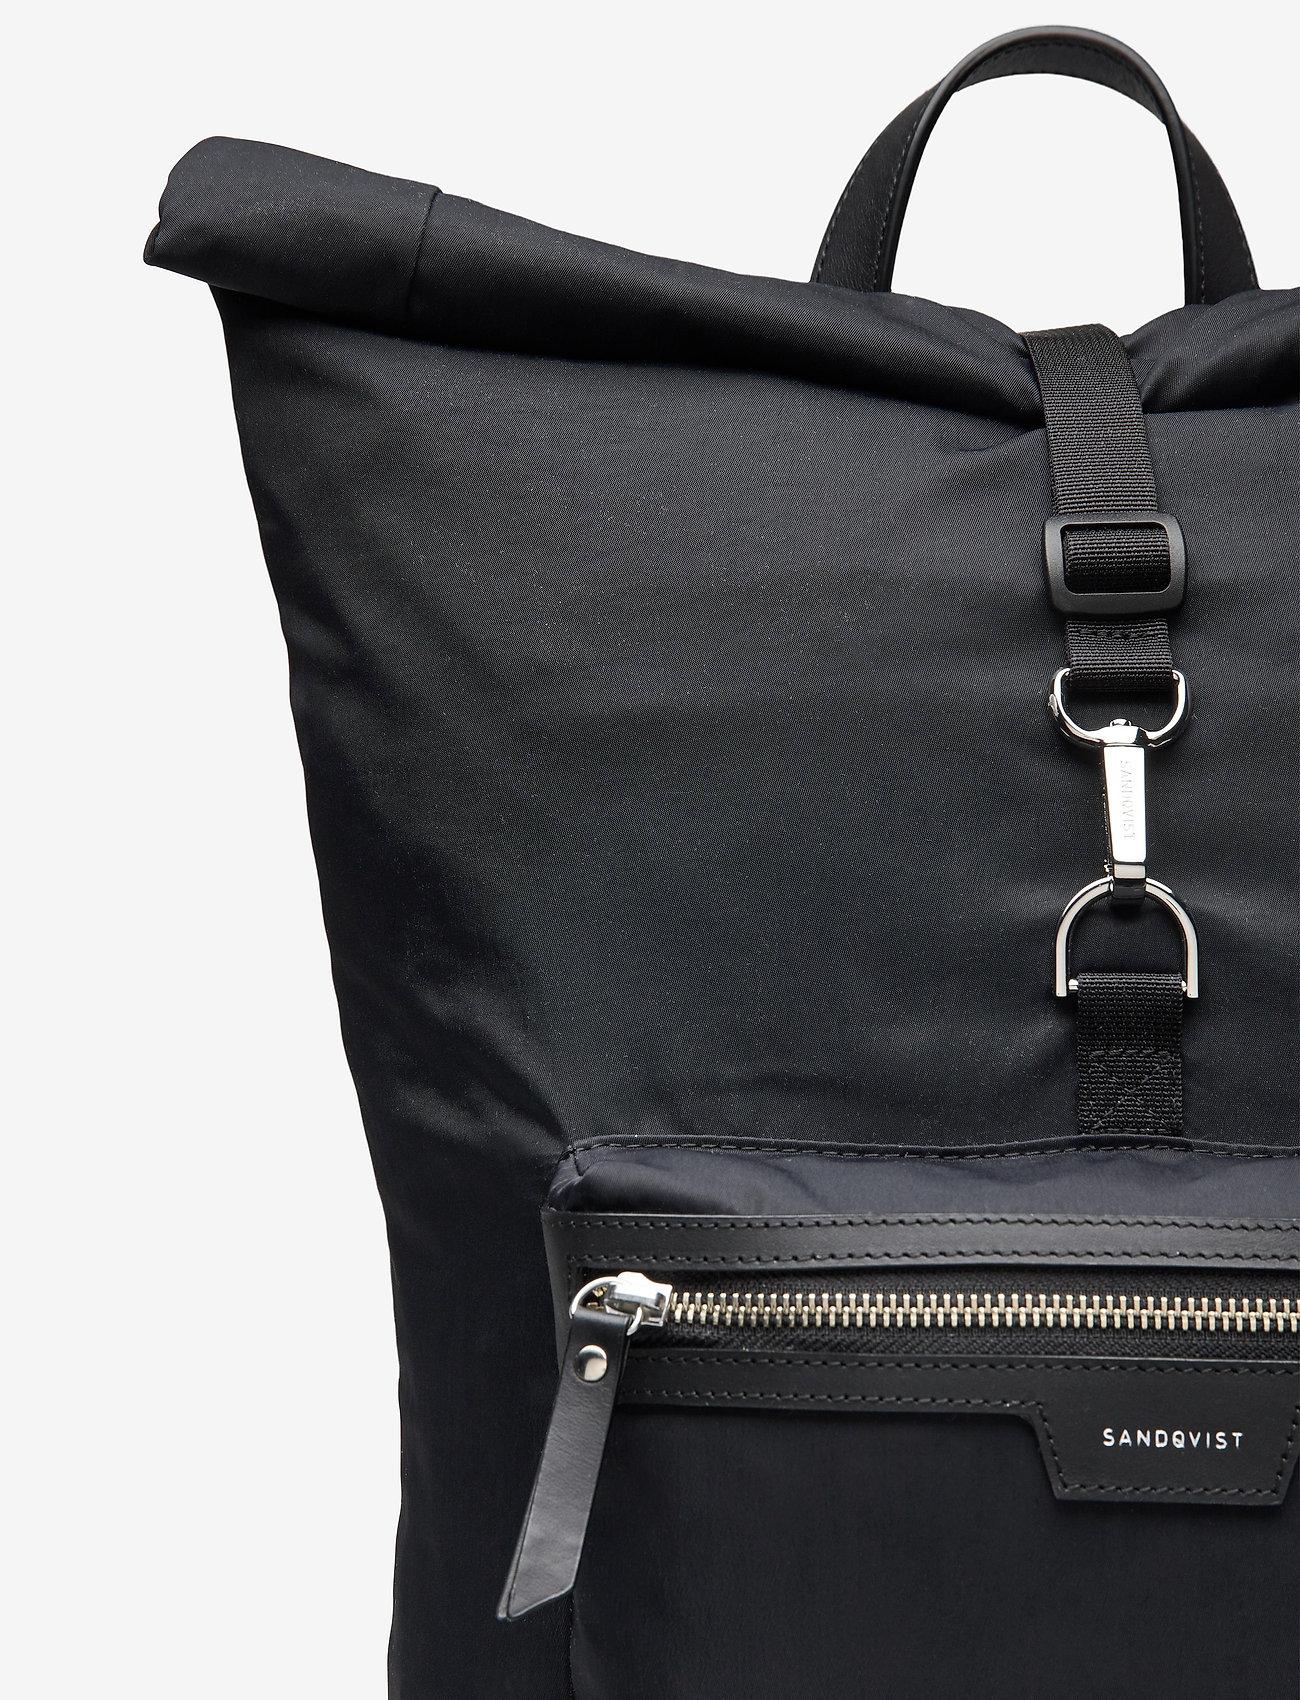 SANDQVIST - SIV - nieuwe mode - black with black leather - 4